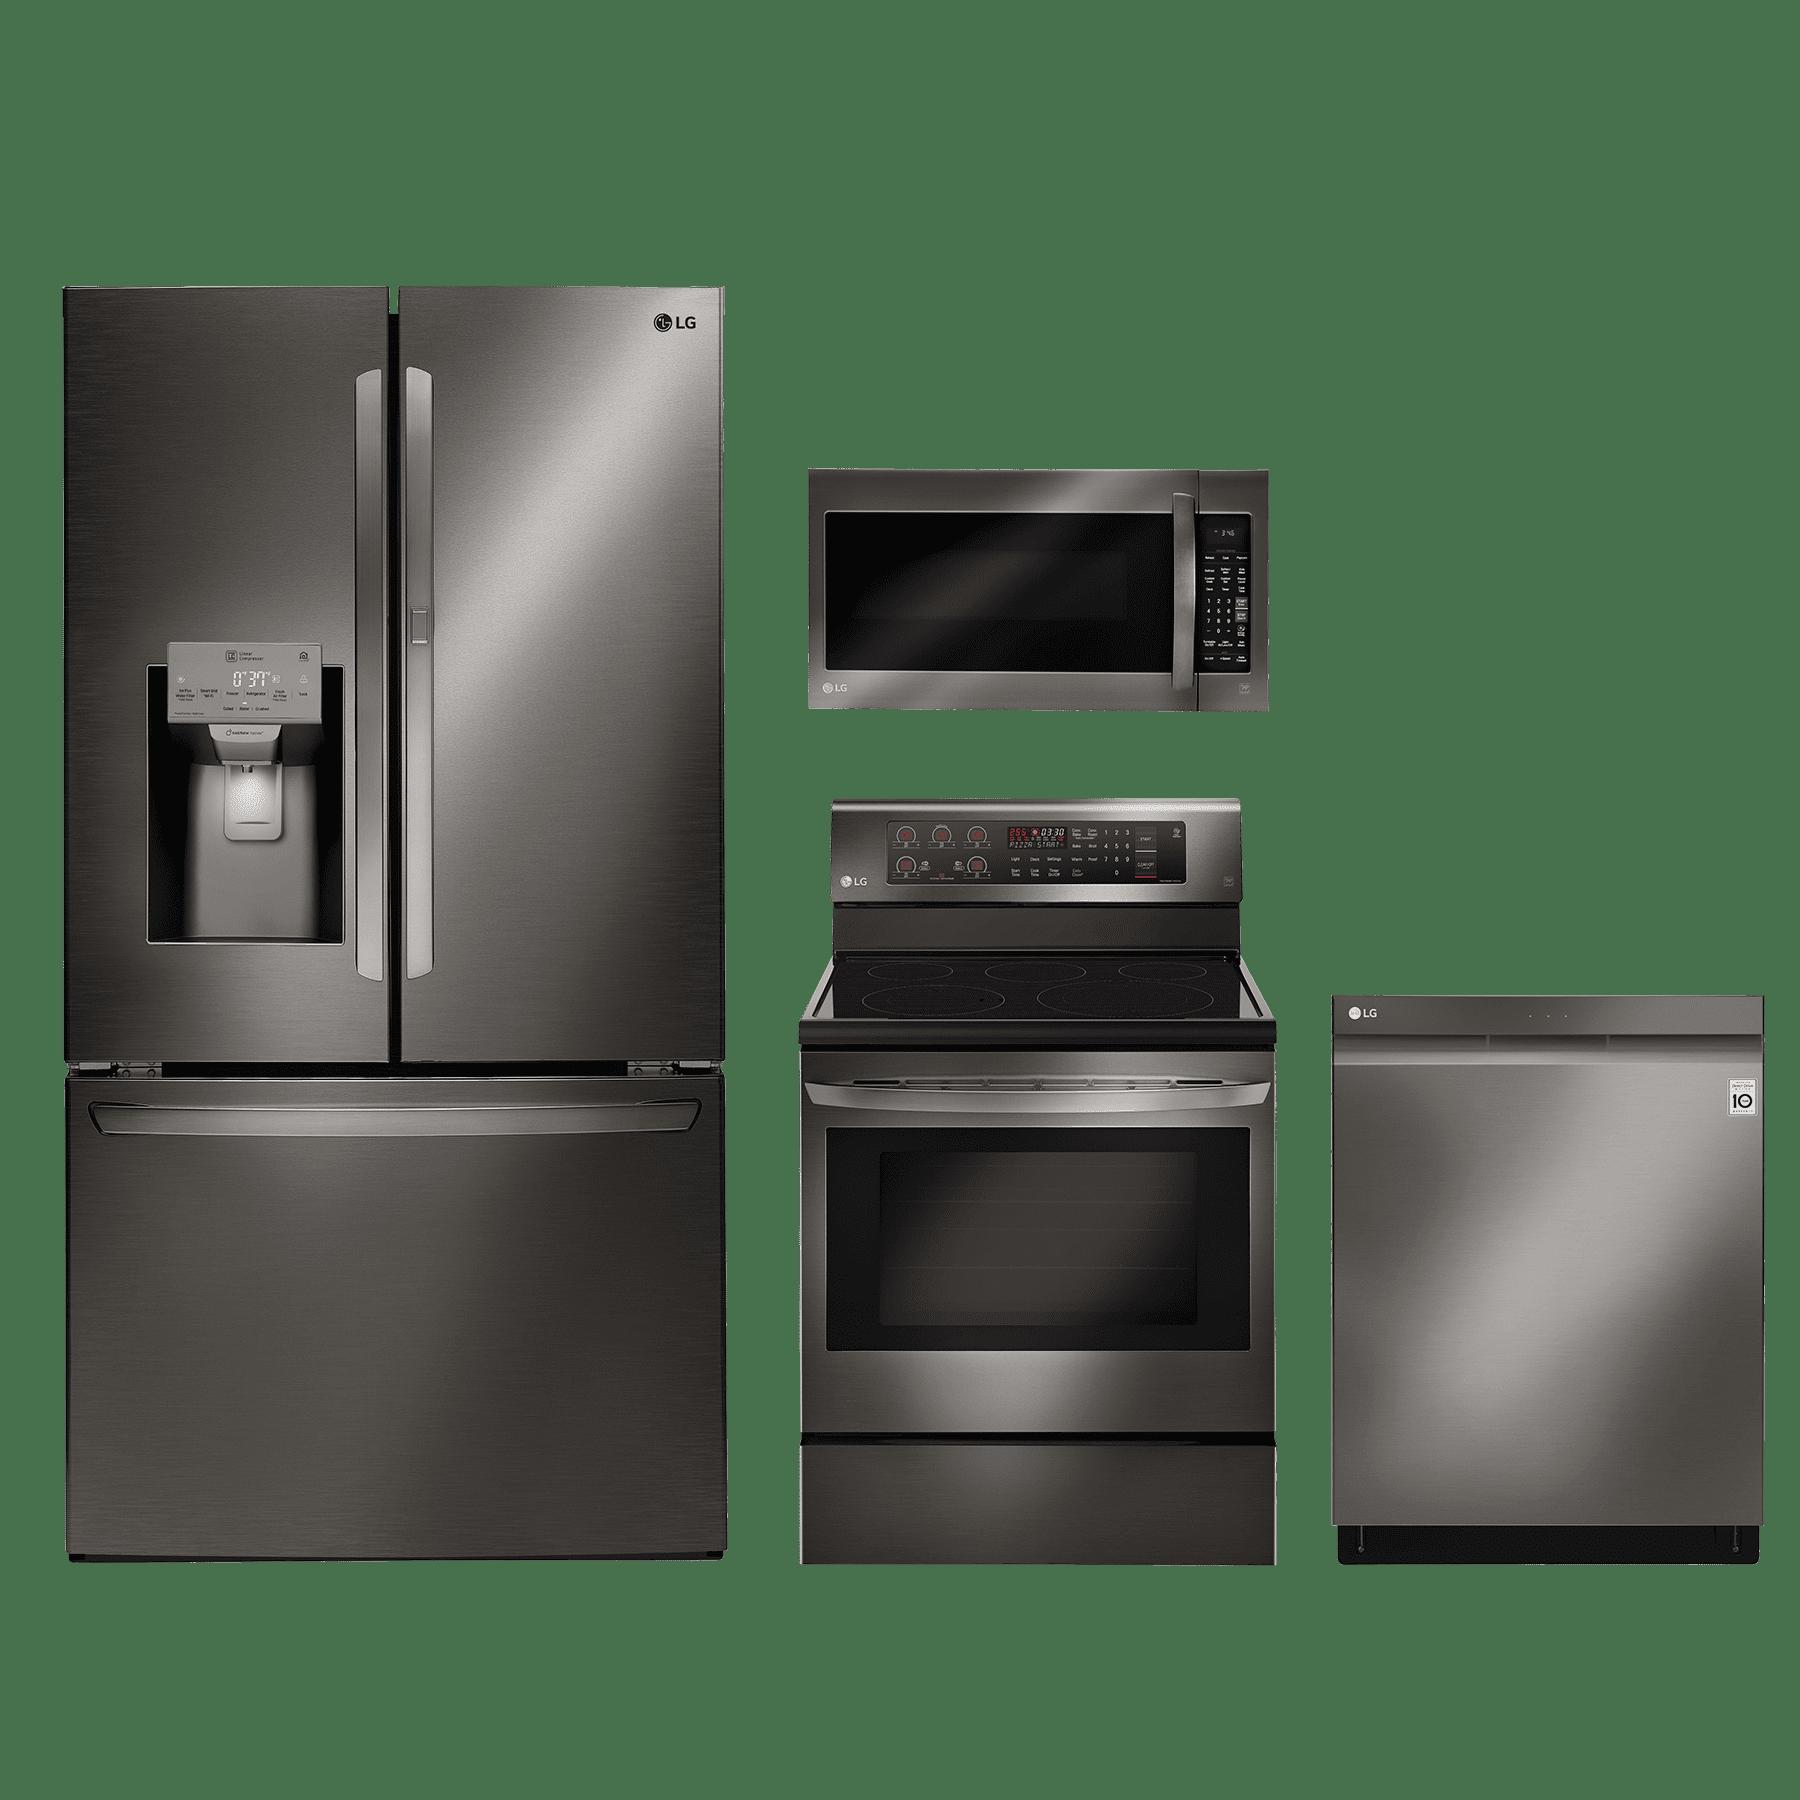 Lg 4 Piece Kitchen Package Black Stainless Steel Lgkitlre3193bd